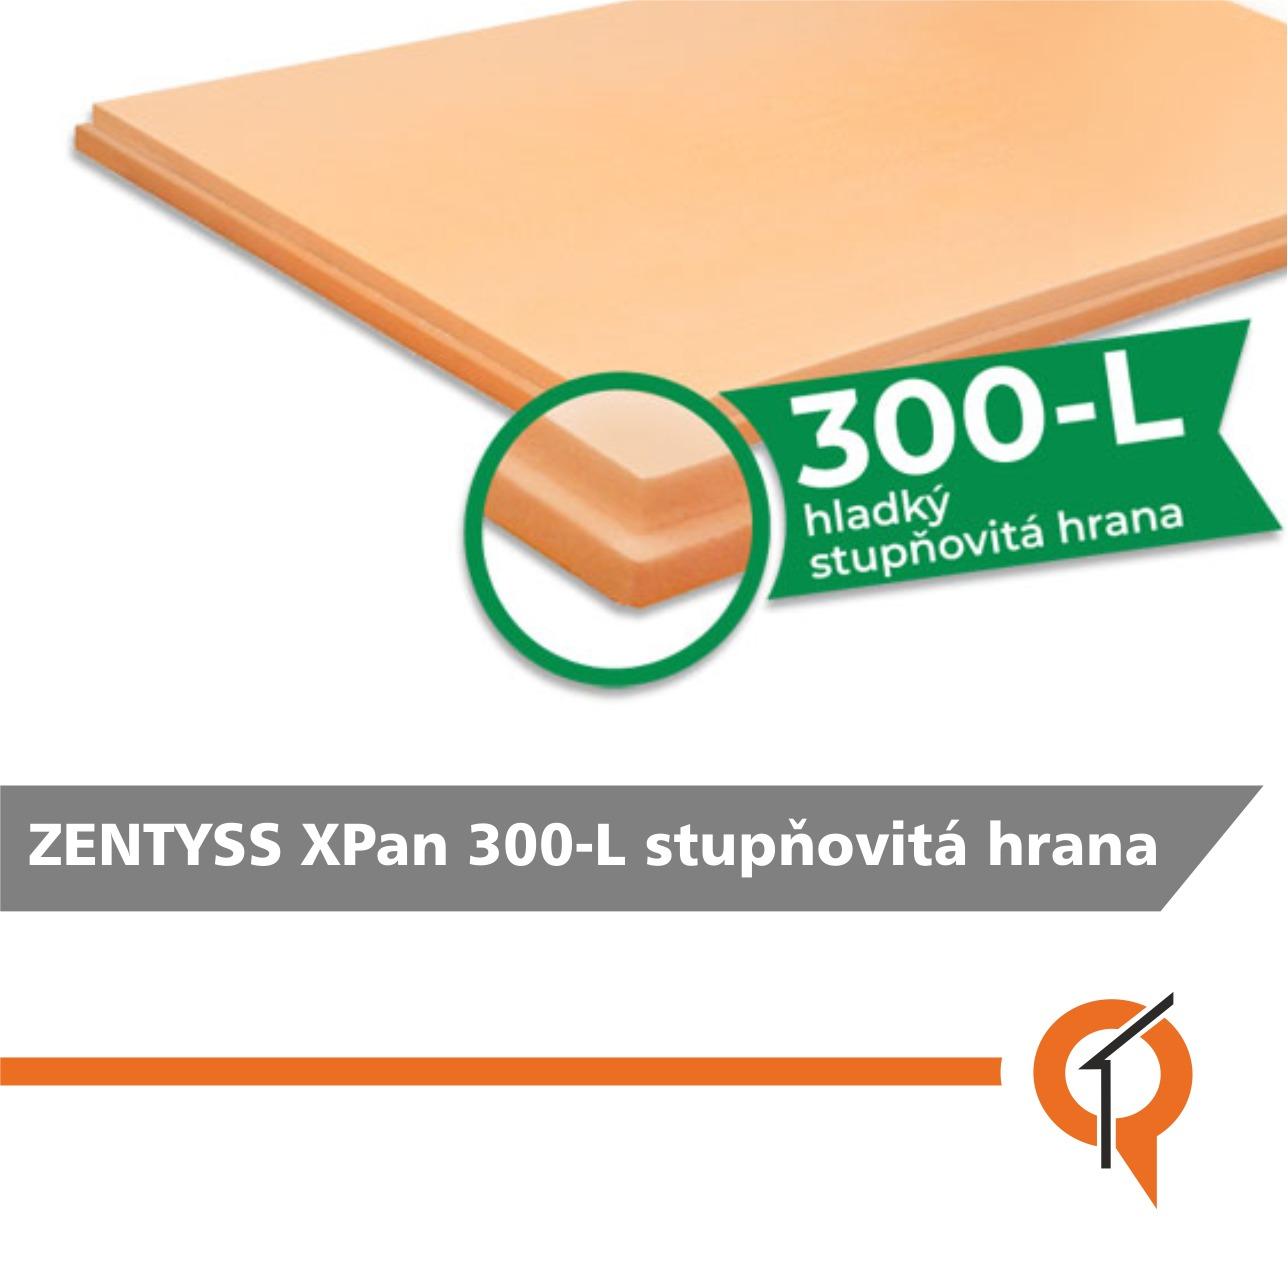 extrudovany_polystyren_xps_qtrend_300_l